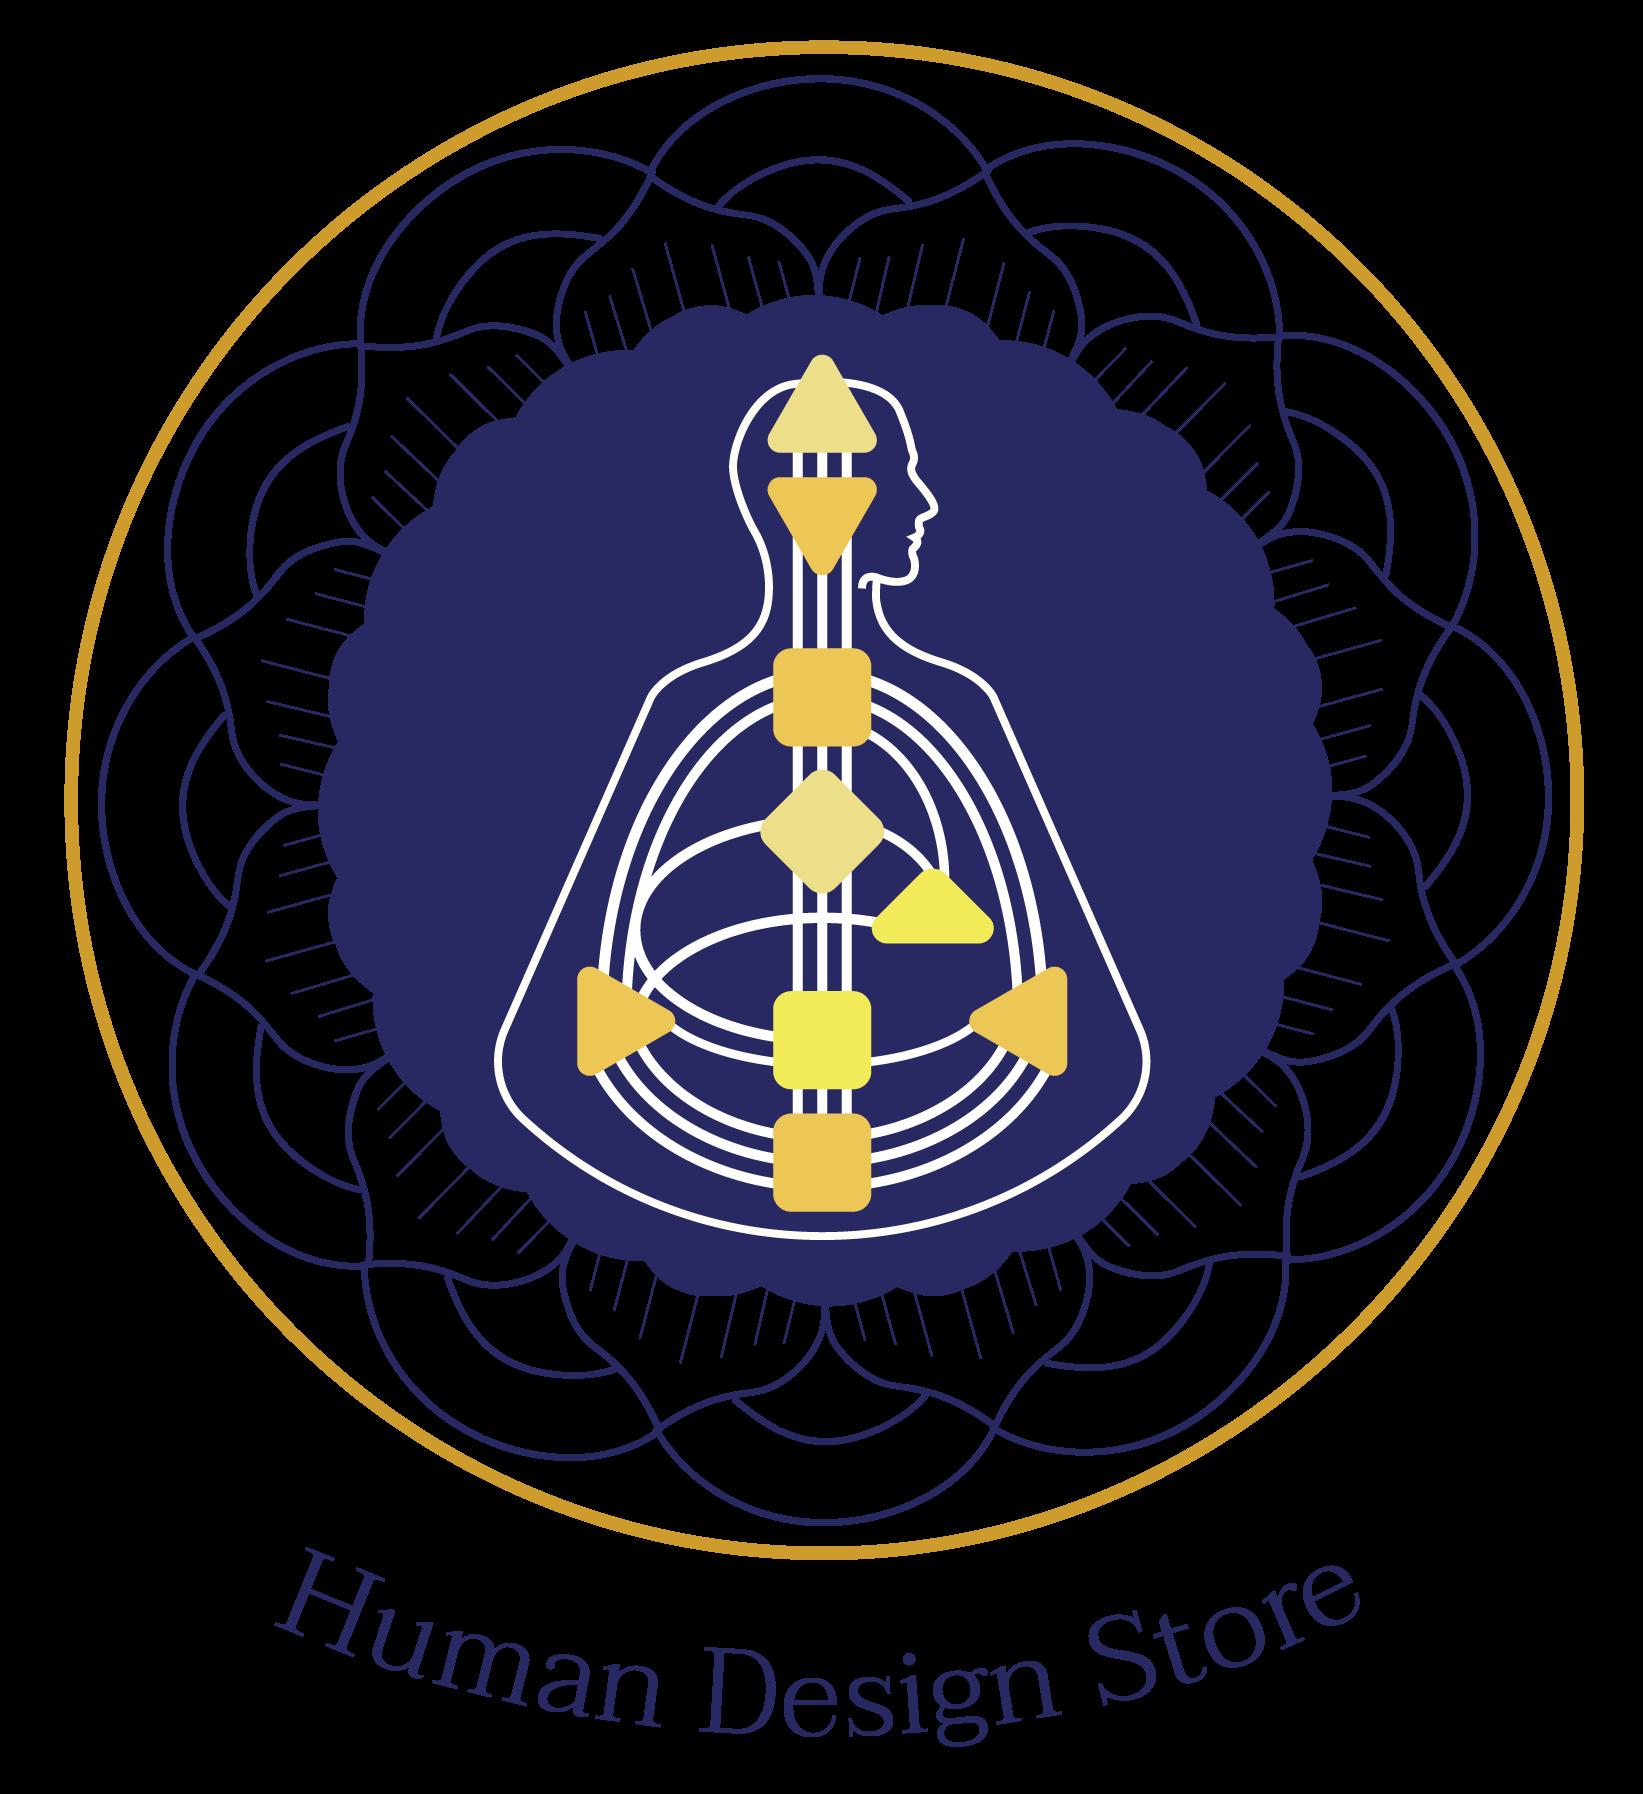 Human Design Store